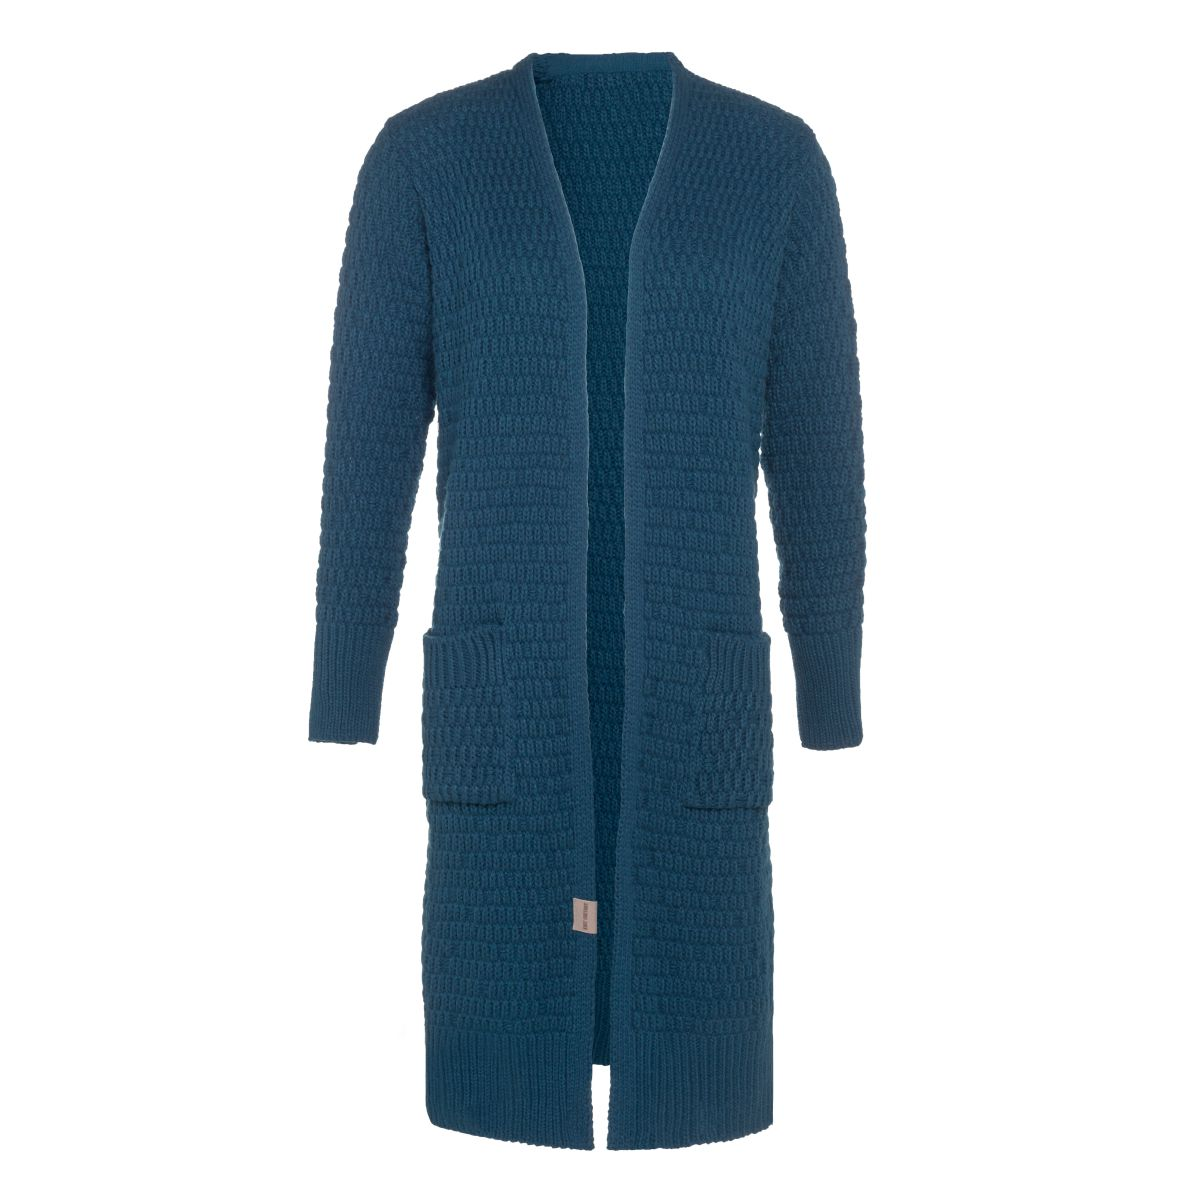 jaida long knitted cardigan petrol 4042 with side pockets